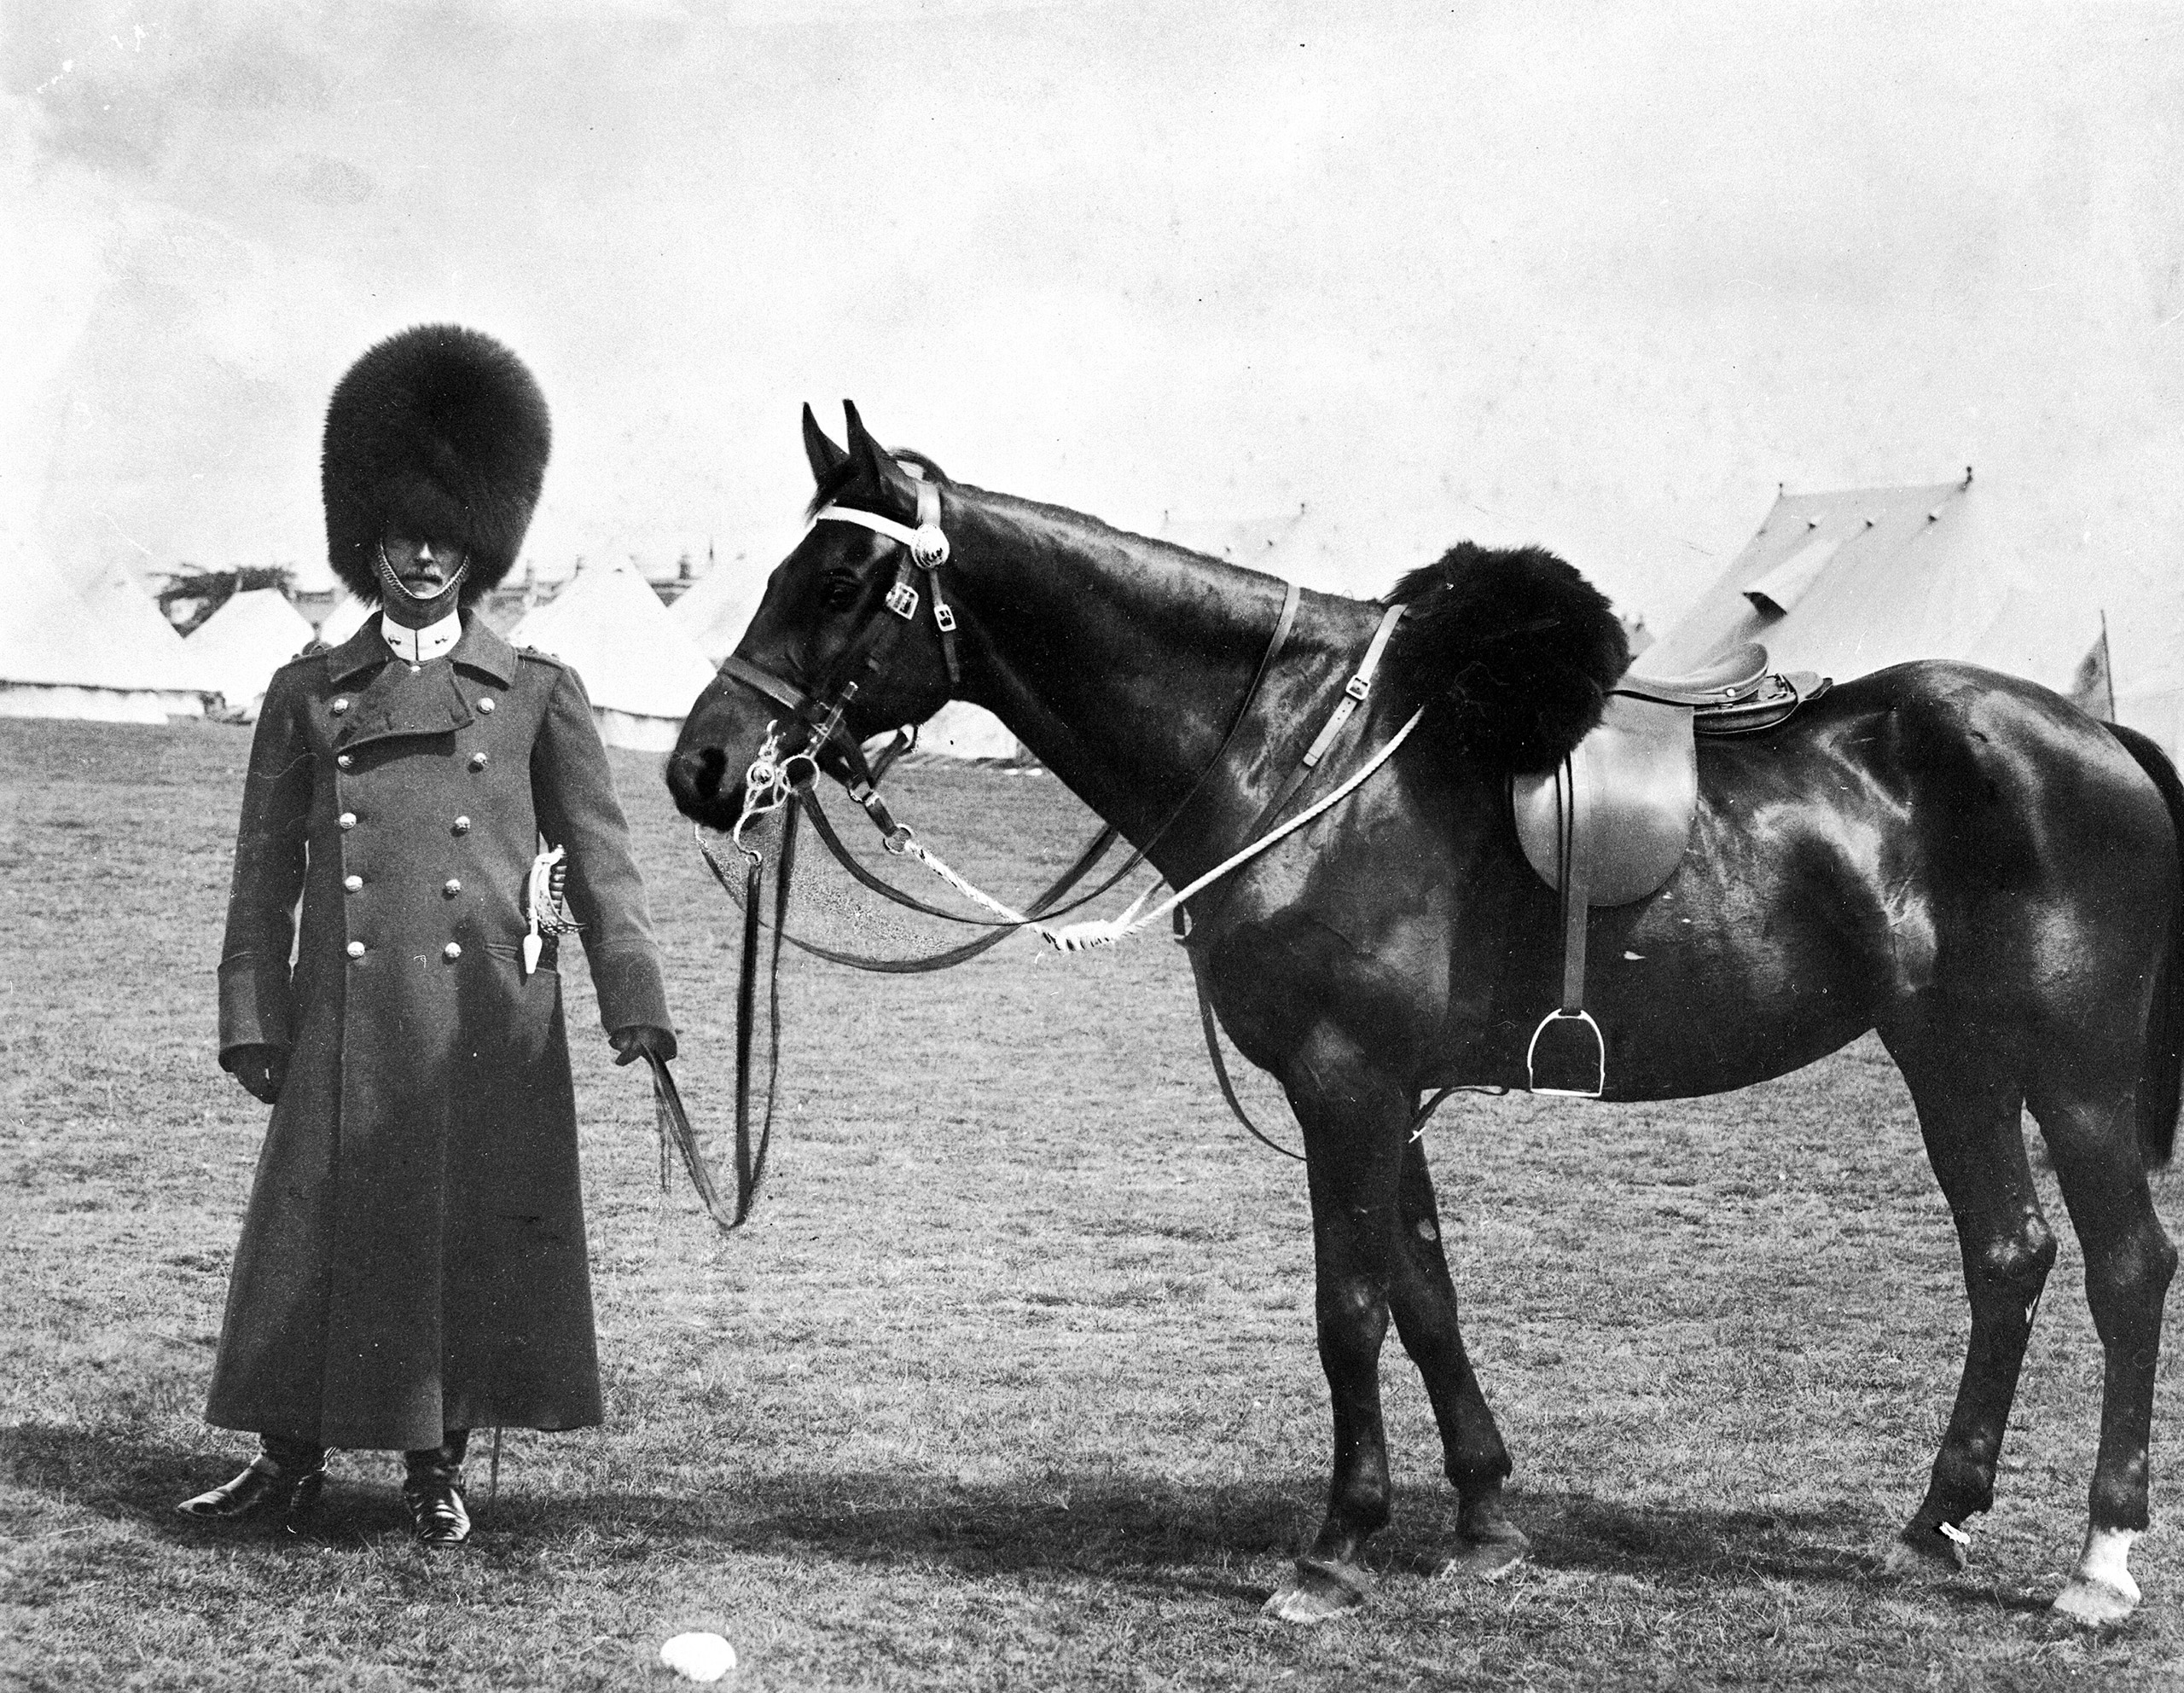 A Grenadier Guard wearing the grenadier's bearskin cap at a military encampment in Dublin, circa 1910.